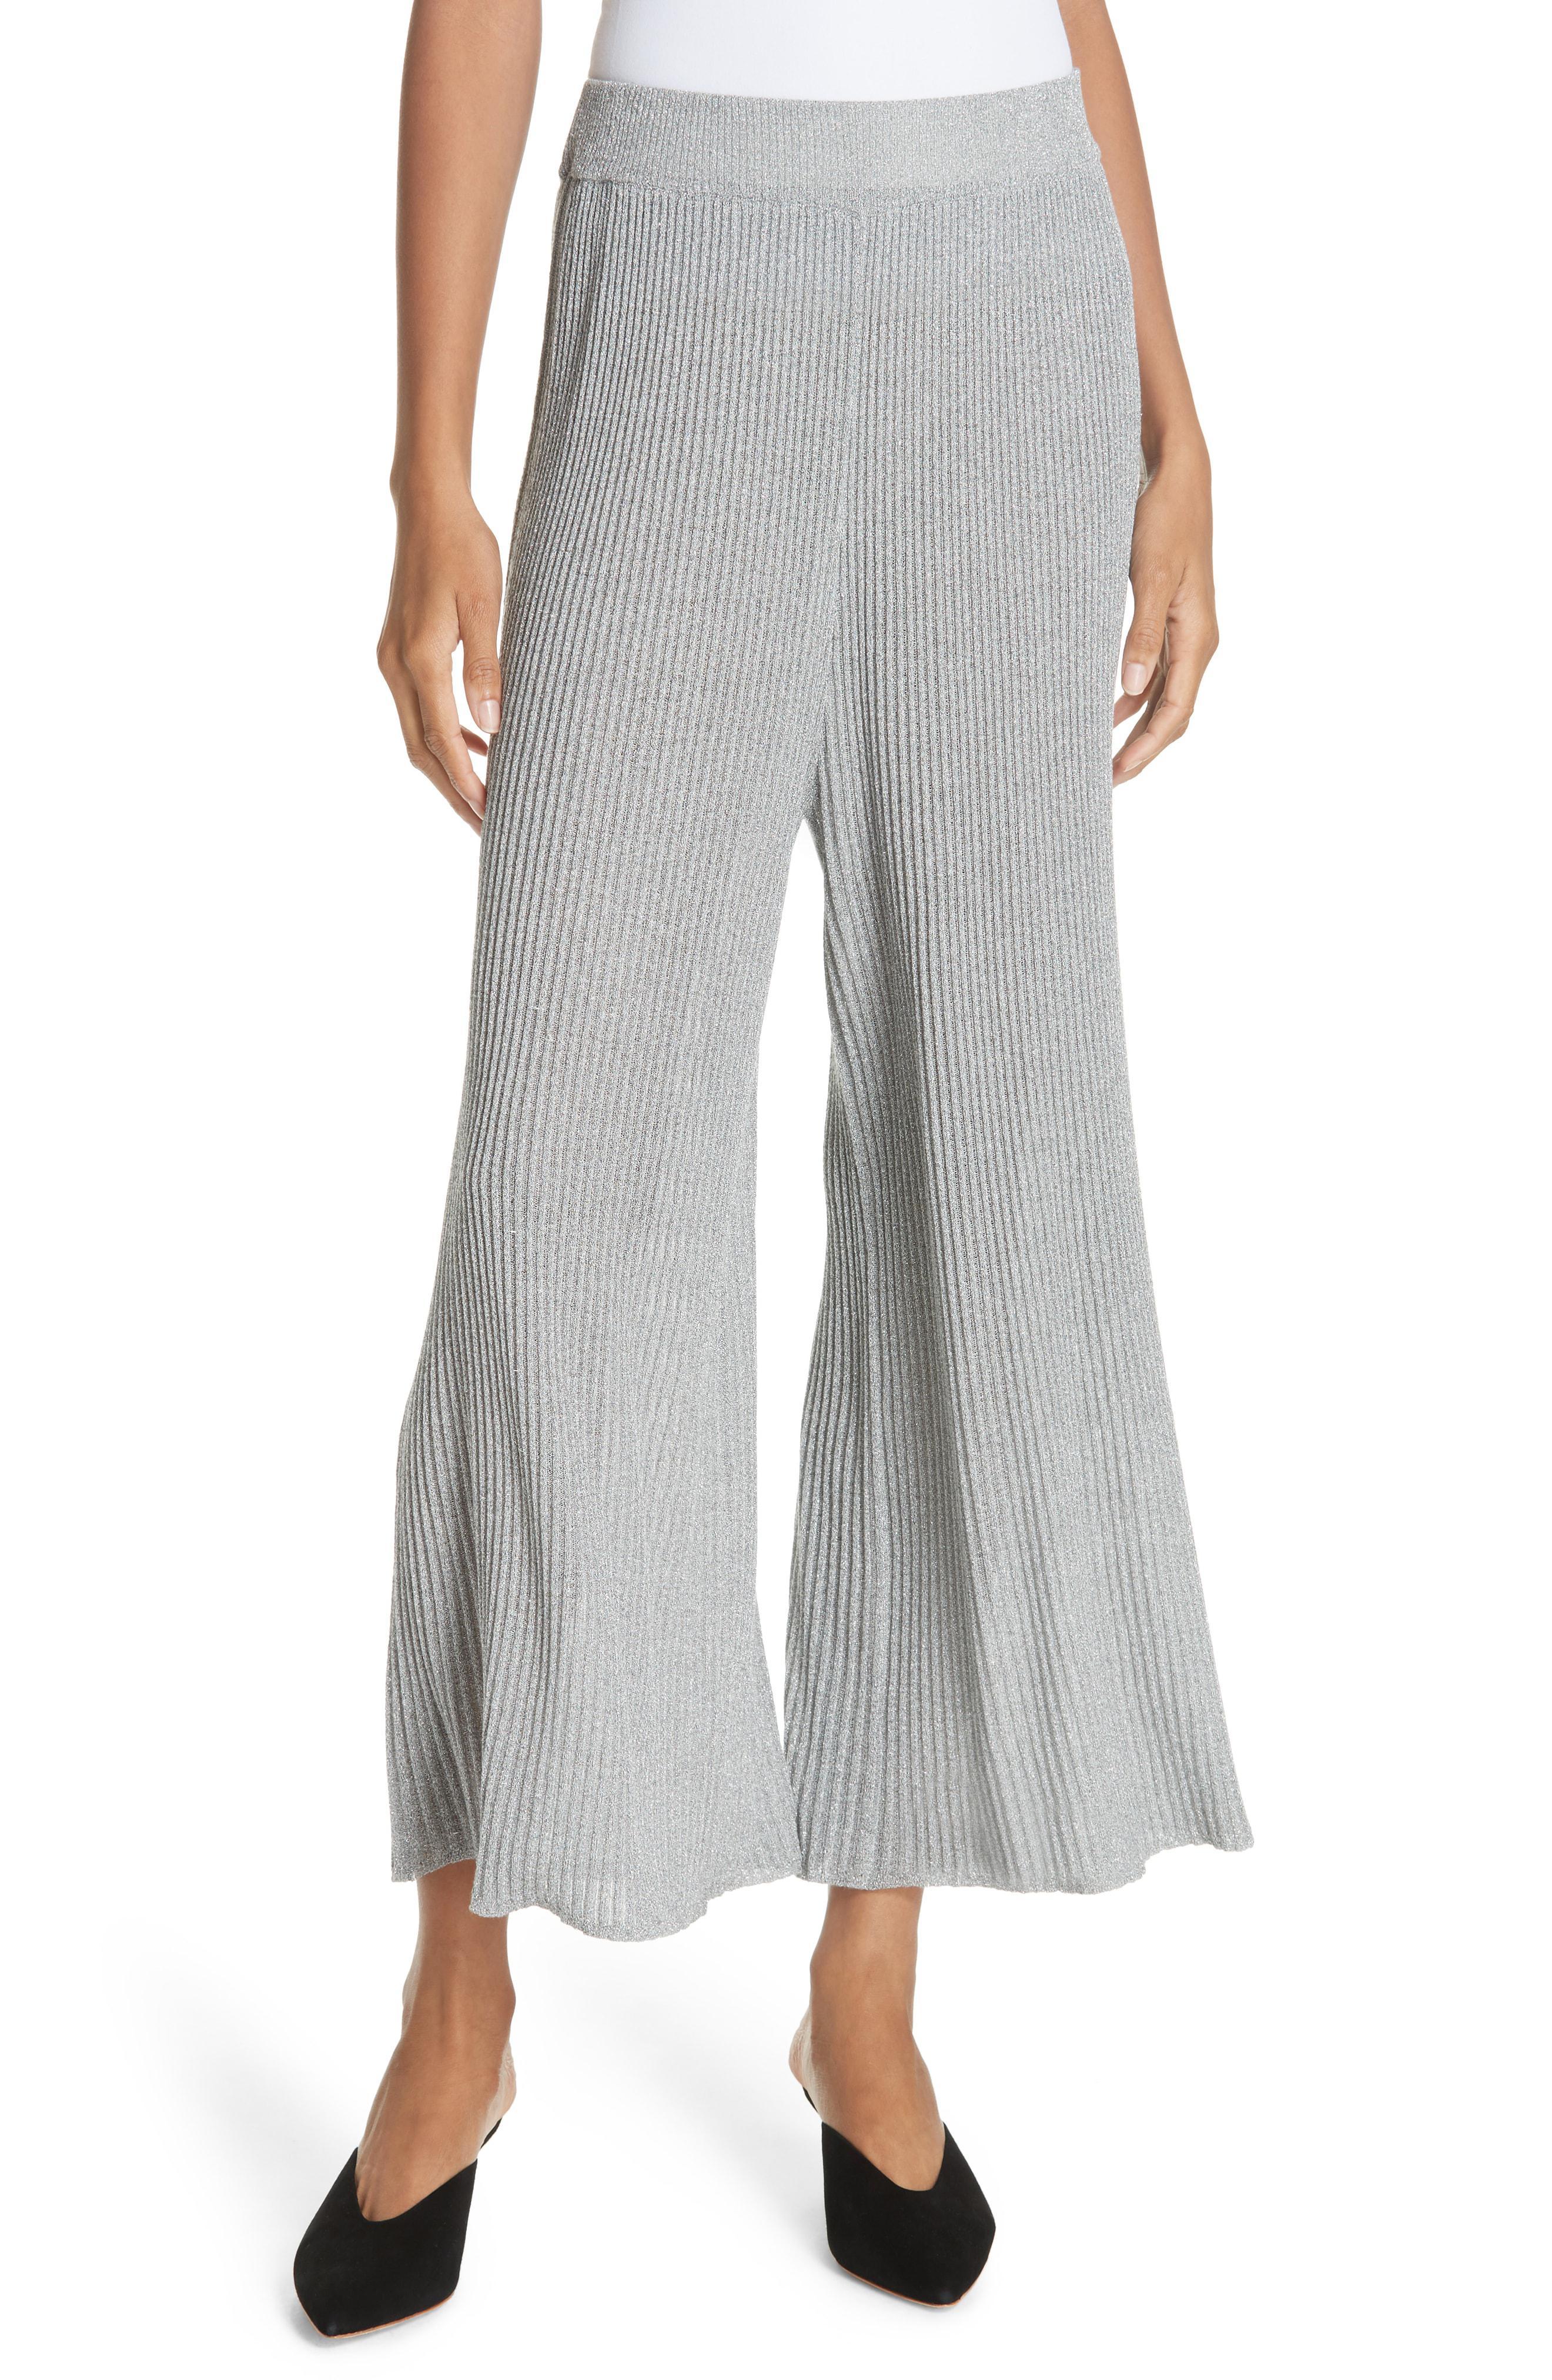 8b6f37f050f197 Lyst - Mes Demoiselles Mikhaela Knit Pants in Gray